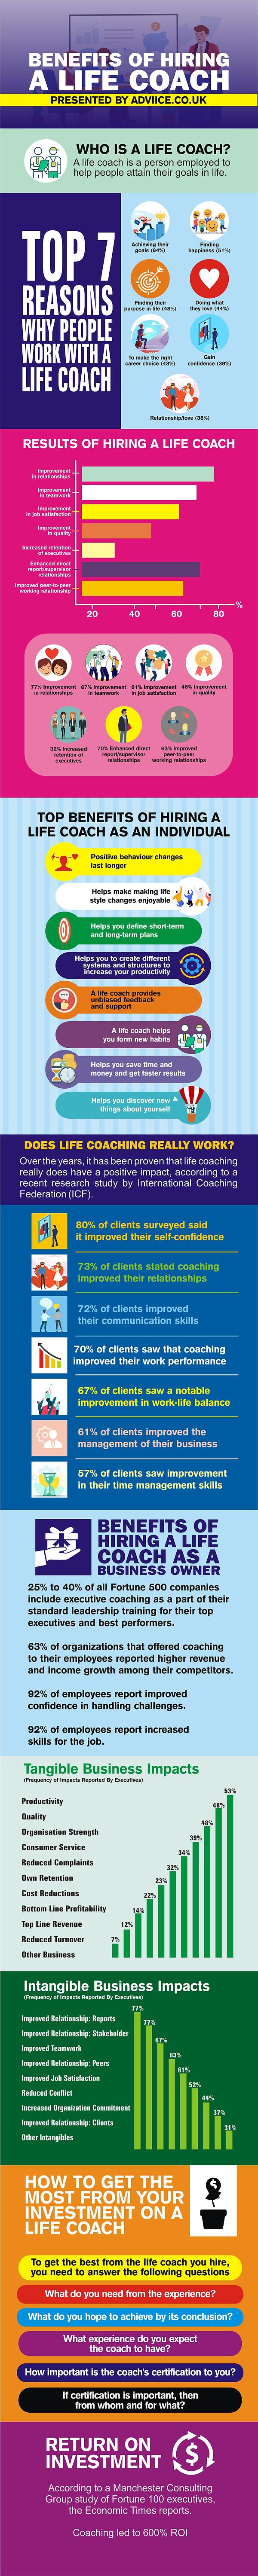 Benefits-of-Hiring-a-Life-Coach (1).jpg